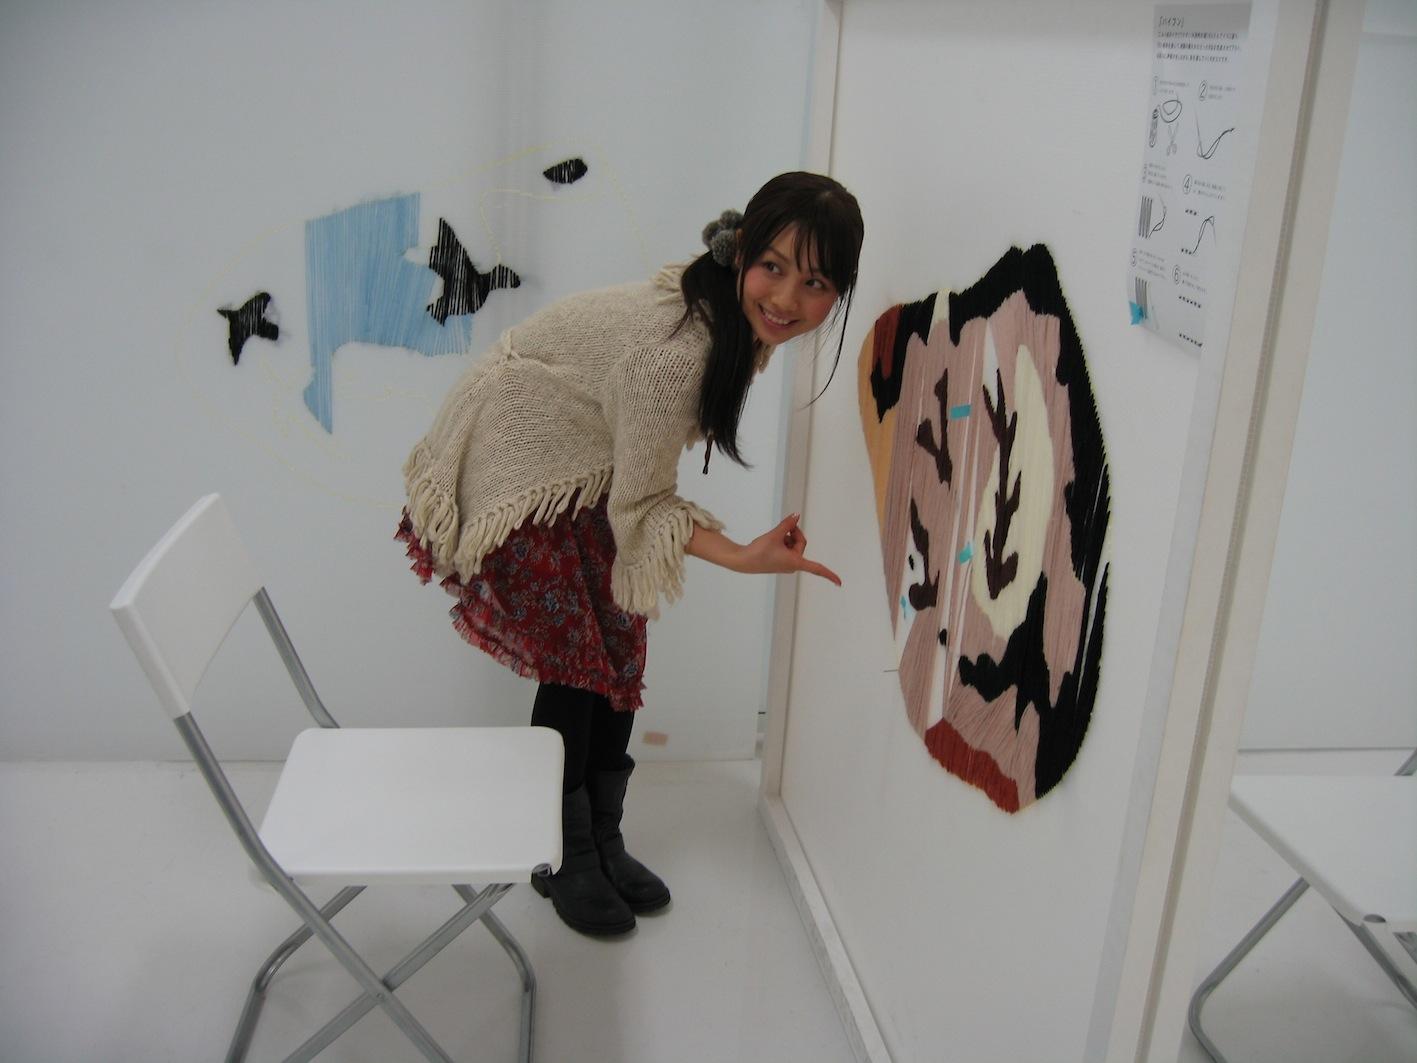 http://blog.3331.jp/staff/file/IMG_0157.JPG